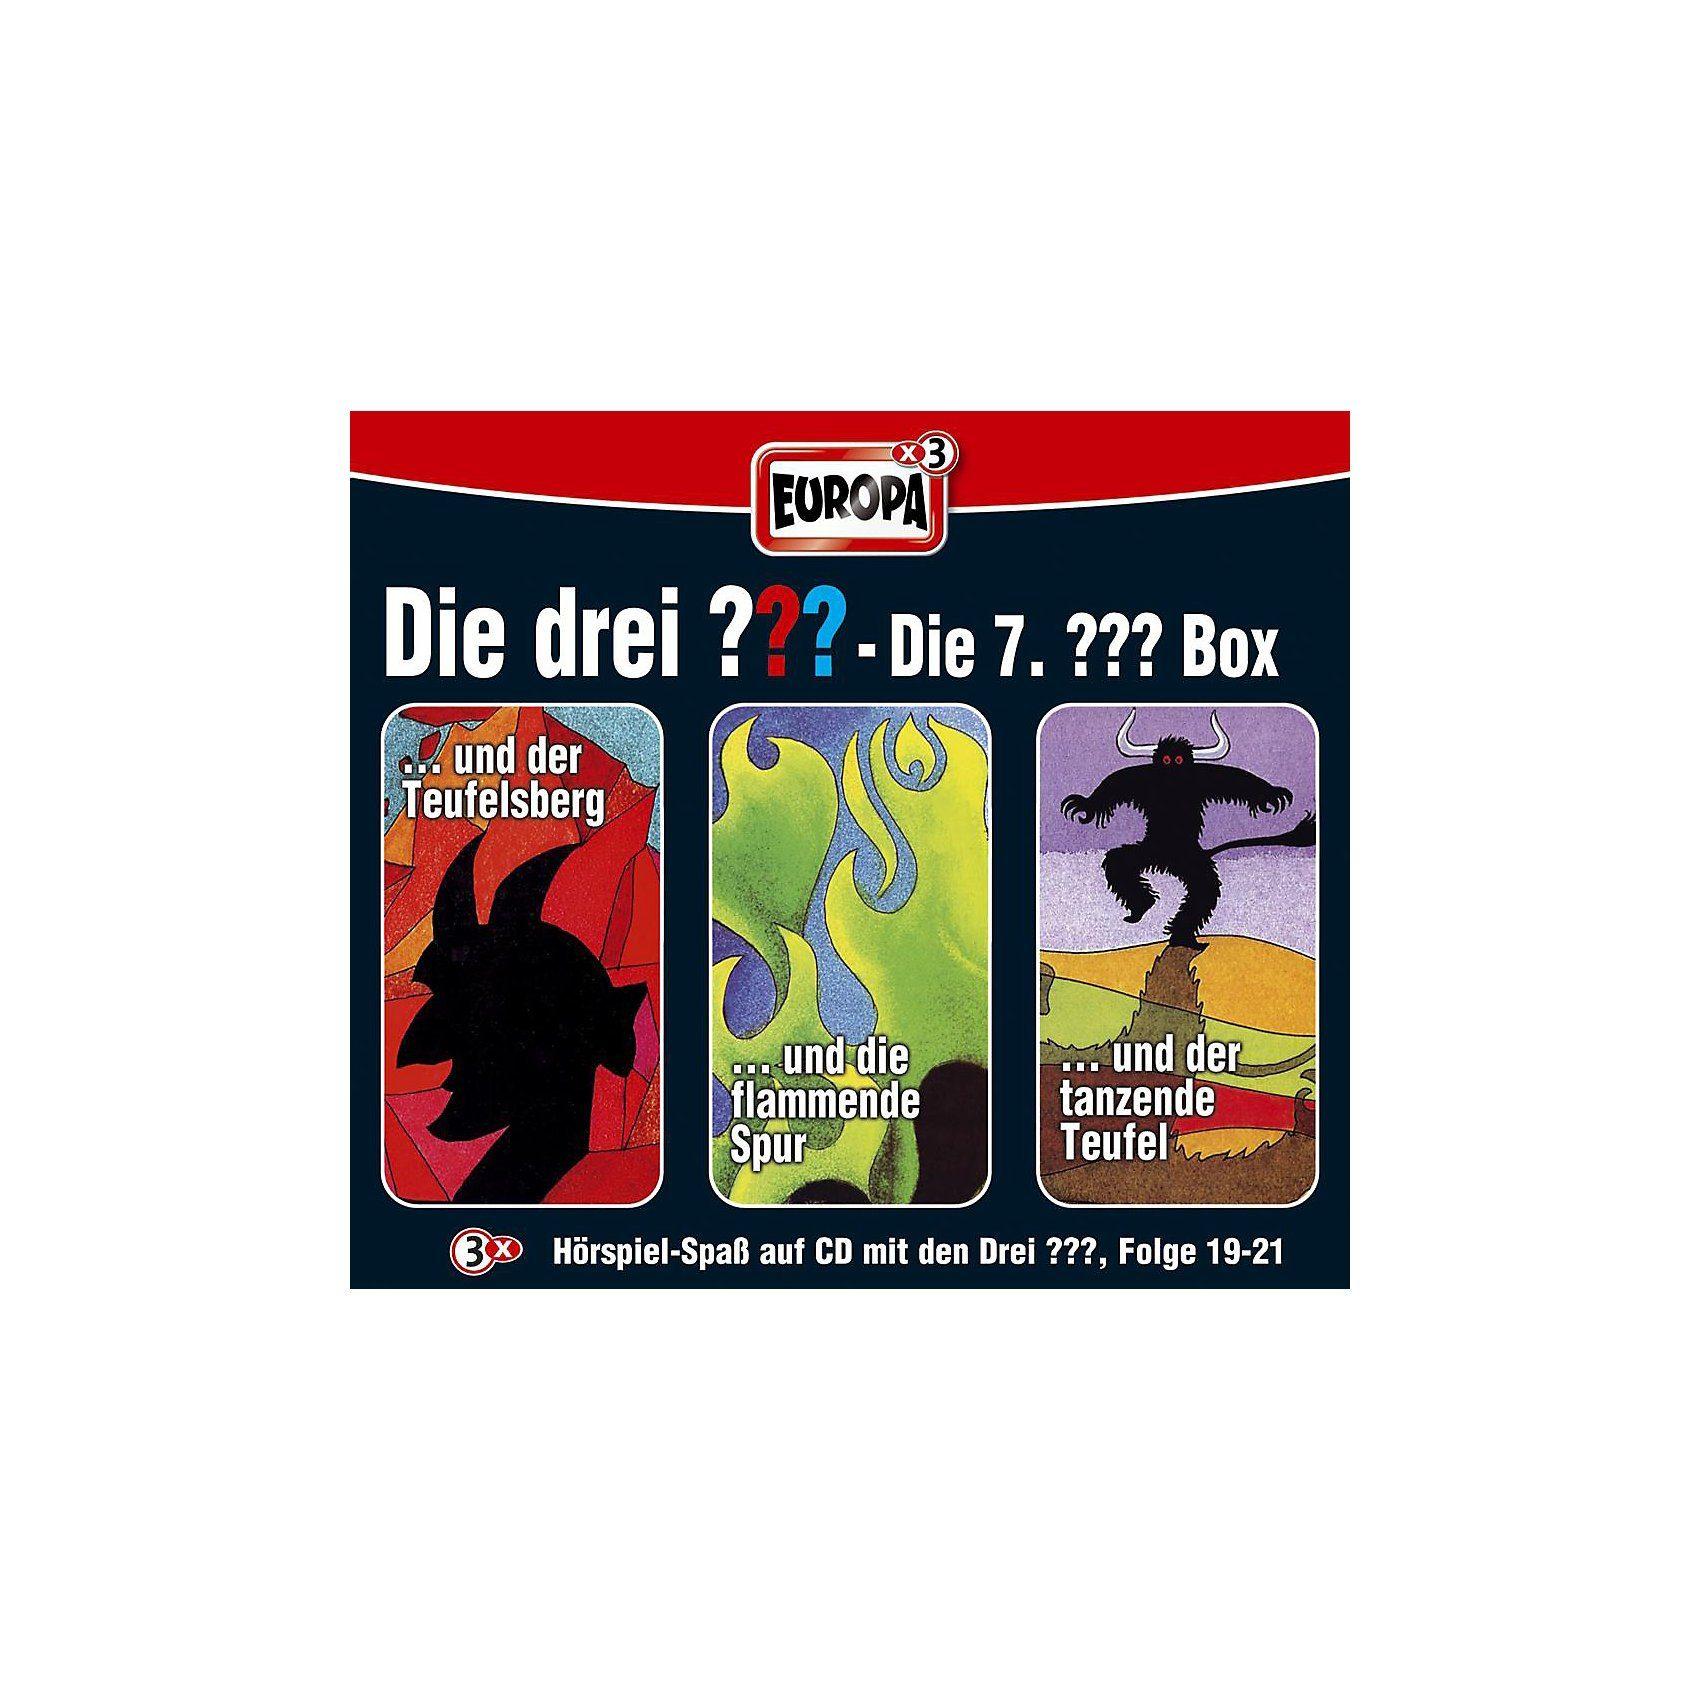 Sony CD Die Drei ???: Box (19-21)